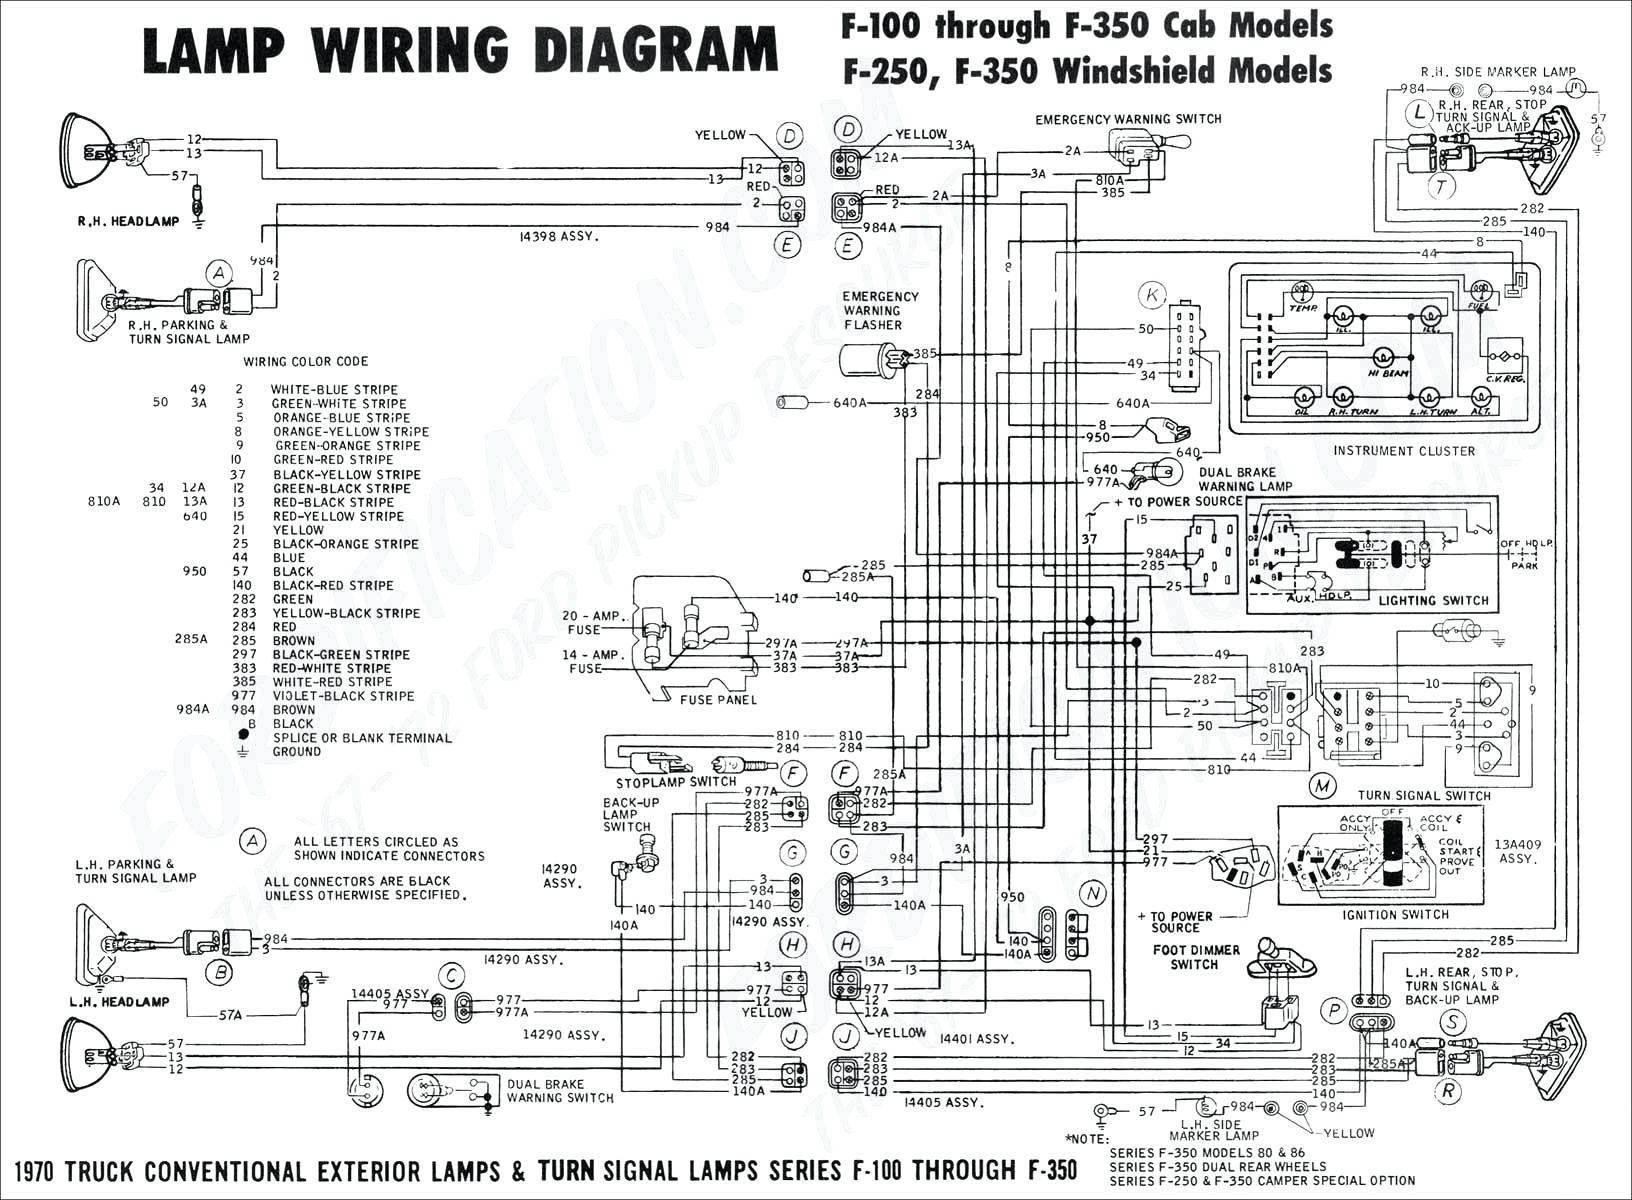 Labeled Engine Diagram Electric Motor Wiring Diagram Symbols Inspirationa Hmsl Wiring Of Labeled Engine Diagram